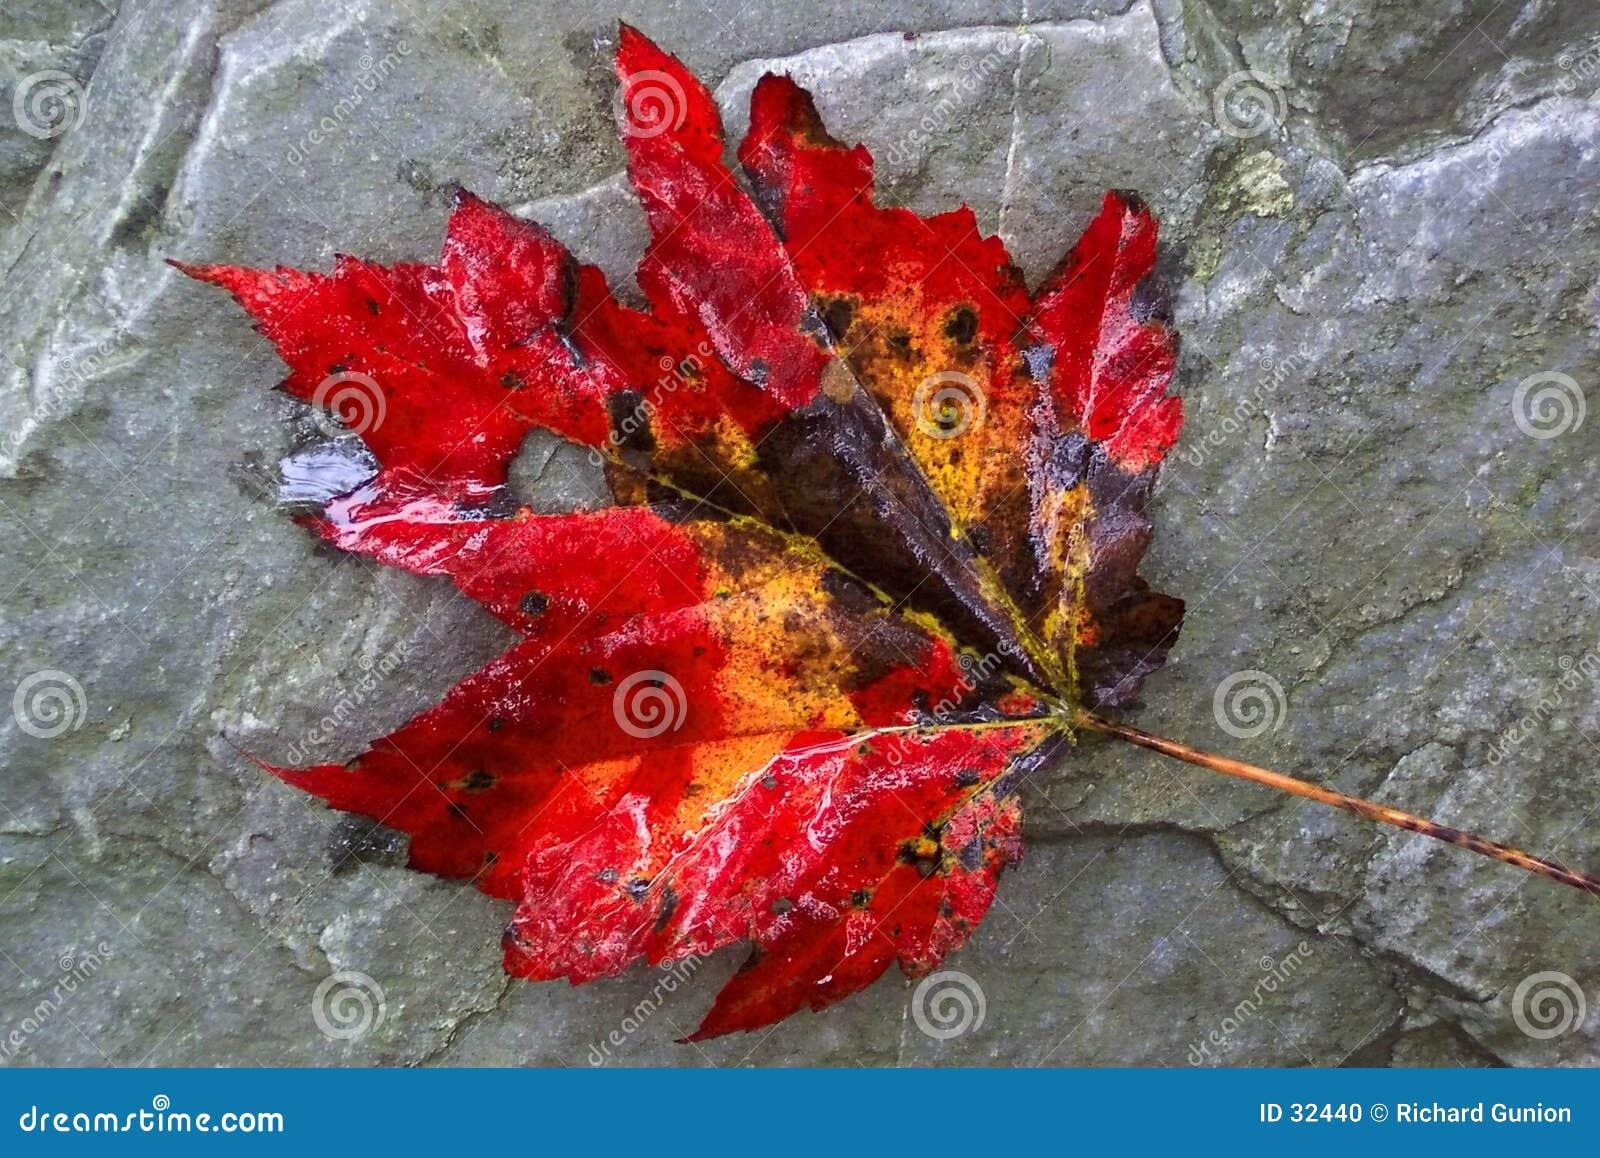 Giant Maple Leaf